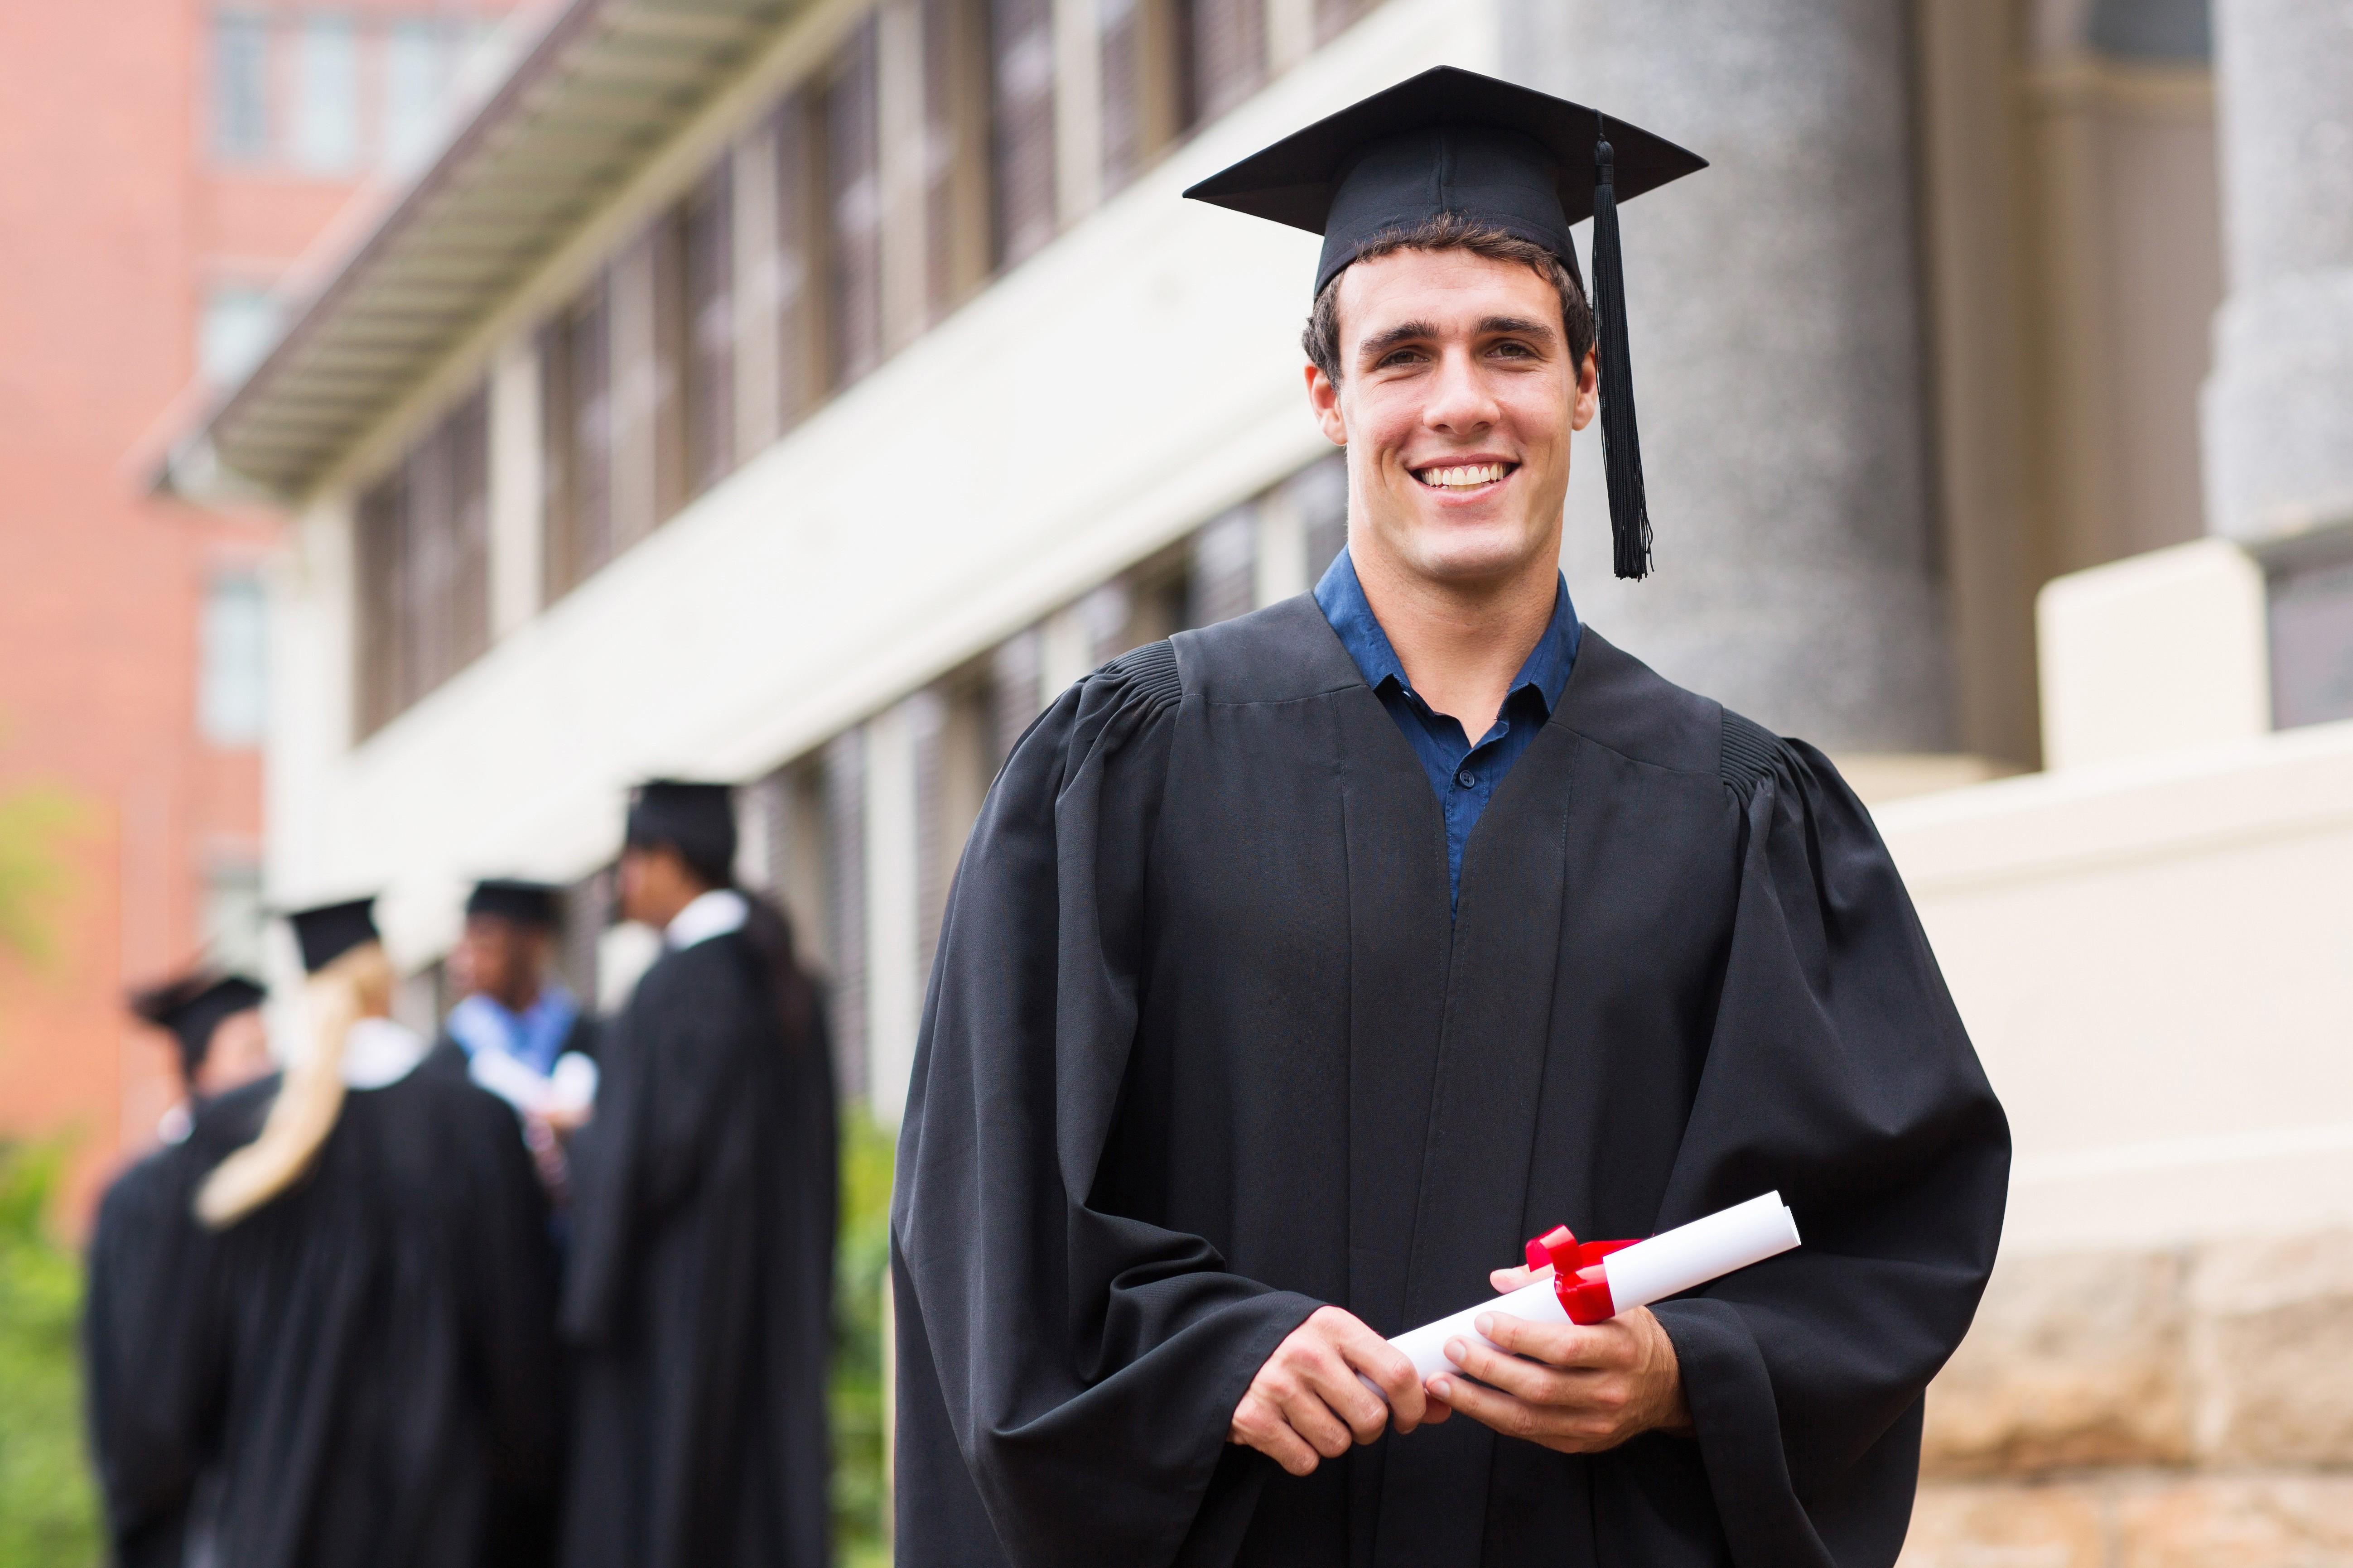 Car insurance for new graduates